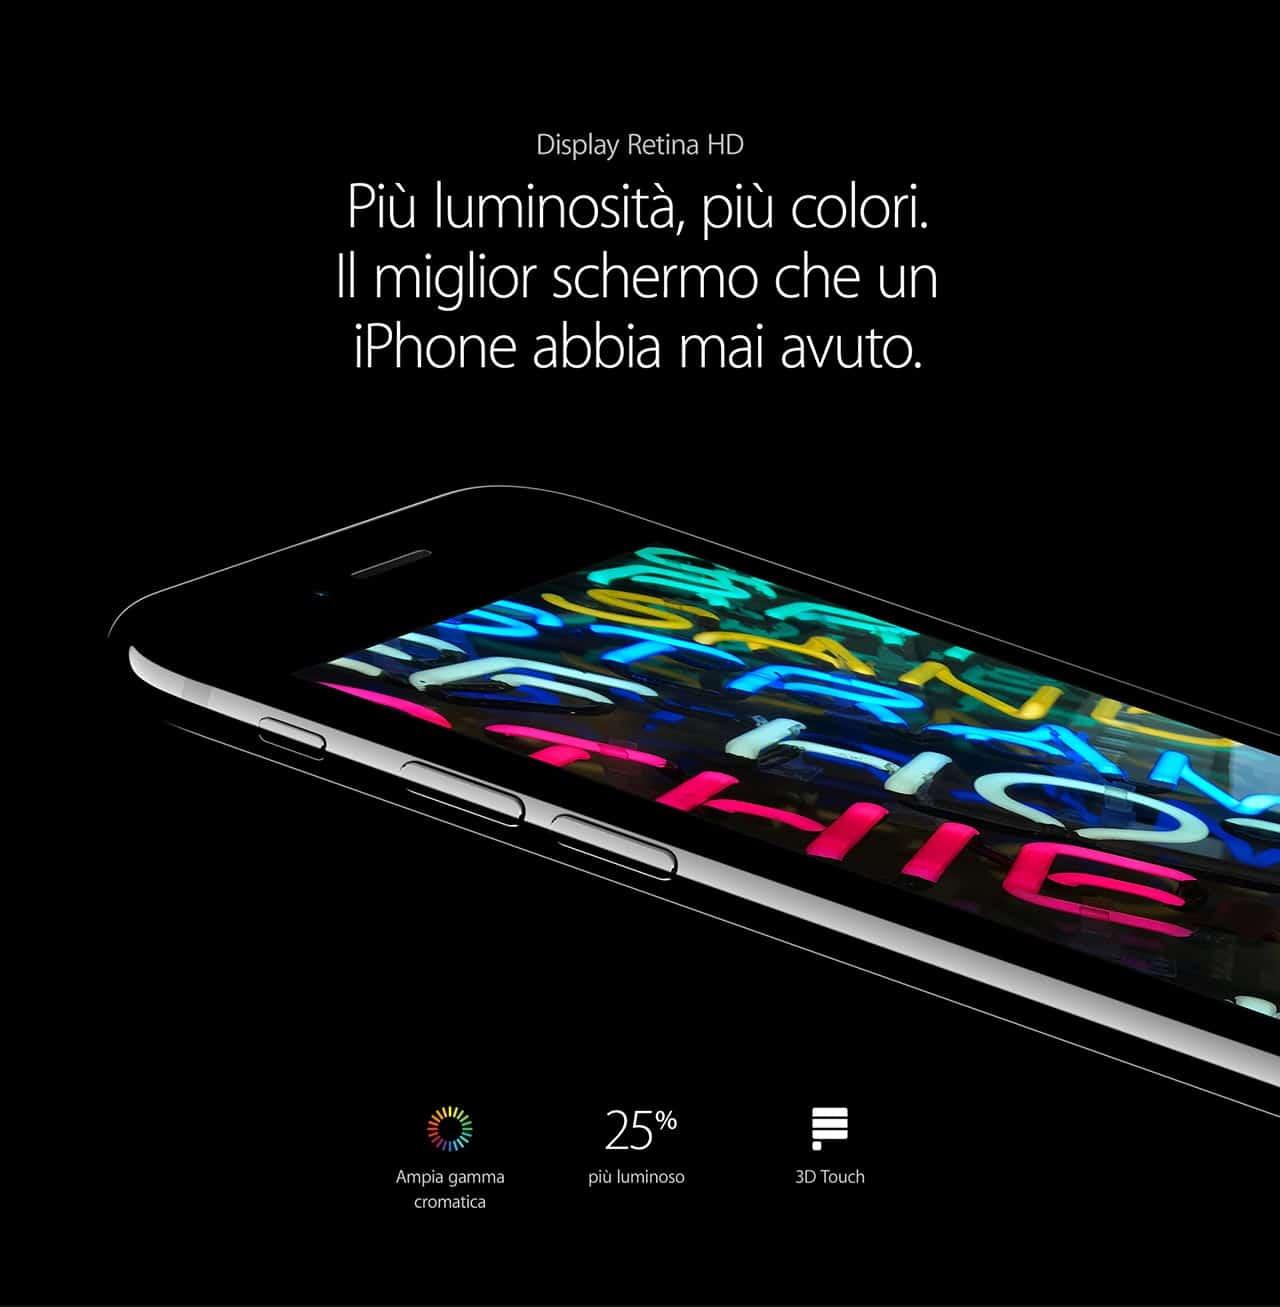 iPhone 7 display retina